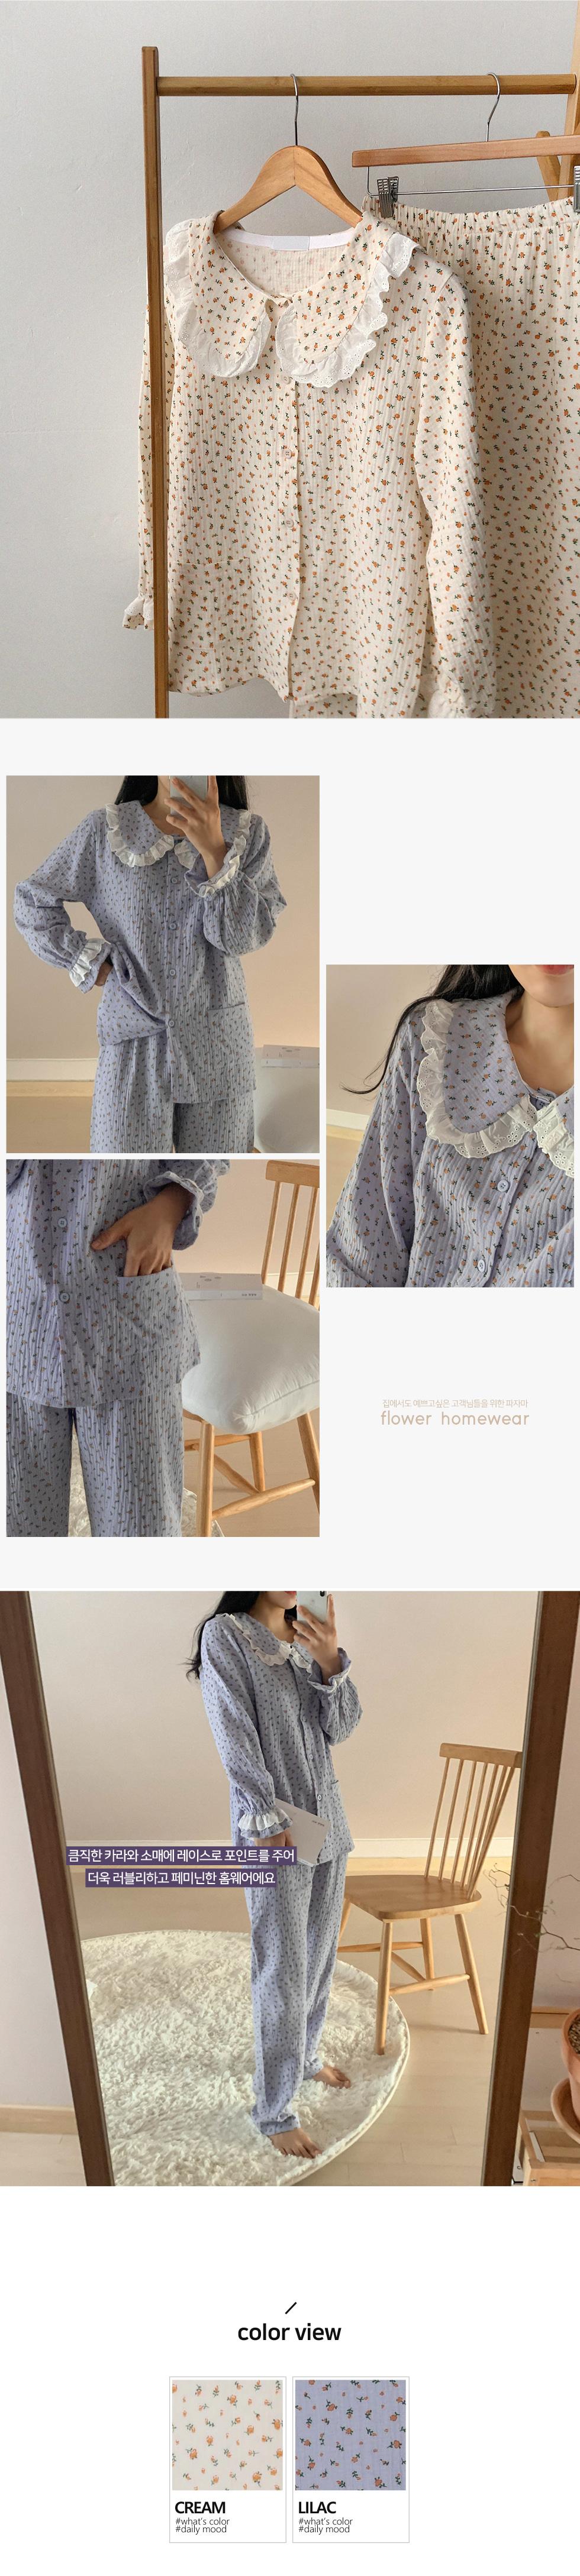 #homewear:_Frill color pajamas set